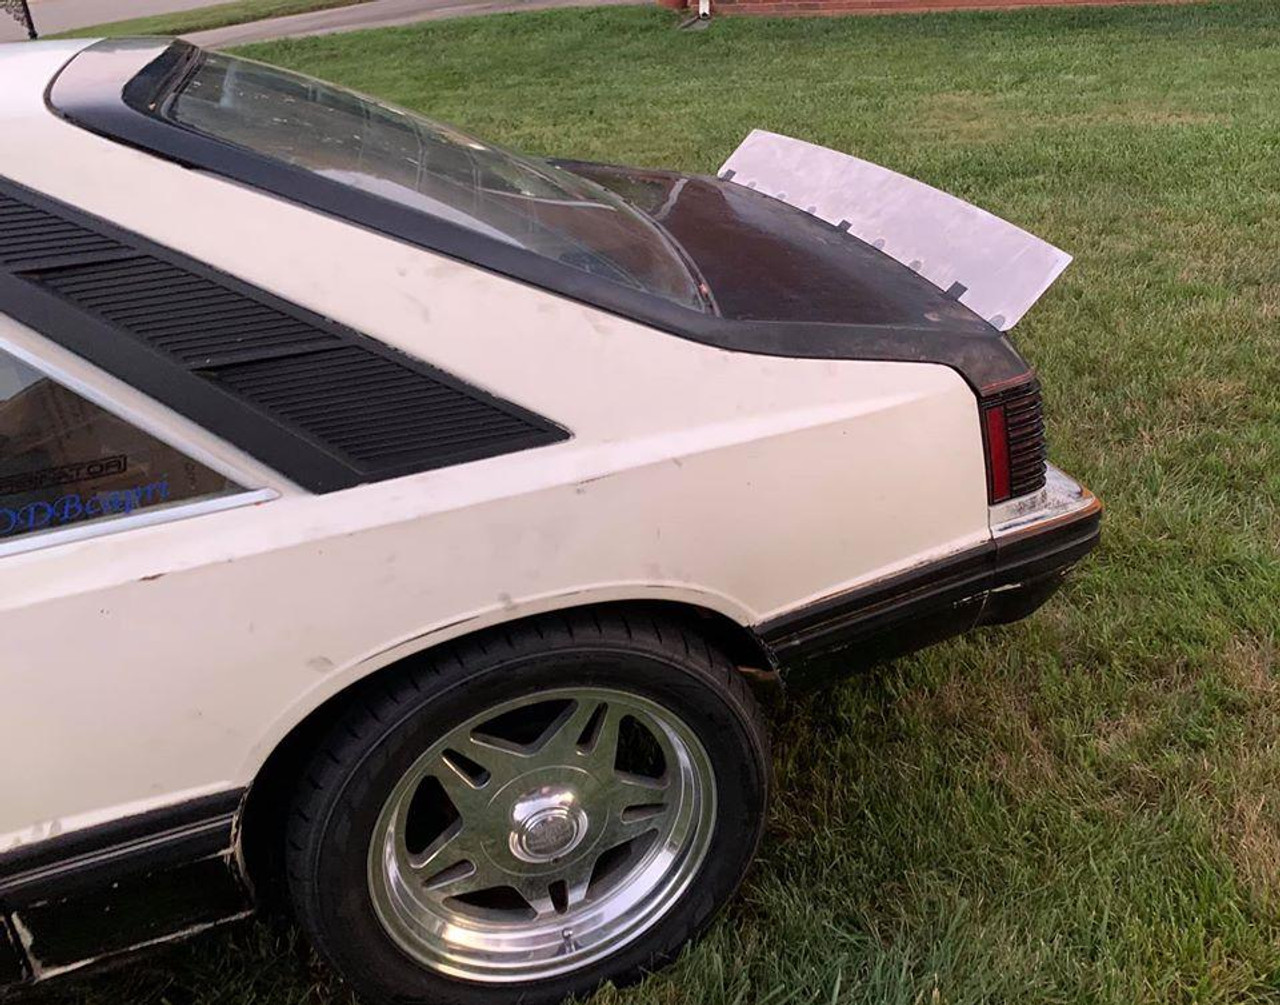 79-93 Mustang Hatchback Ducktail Spoiler by Cerbinator Auto Designs